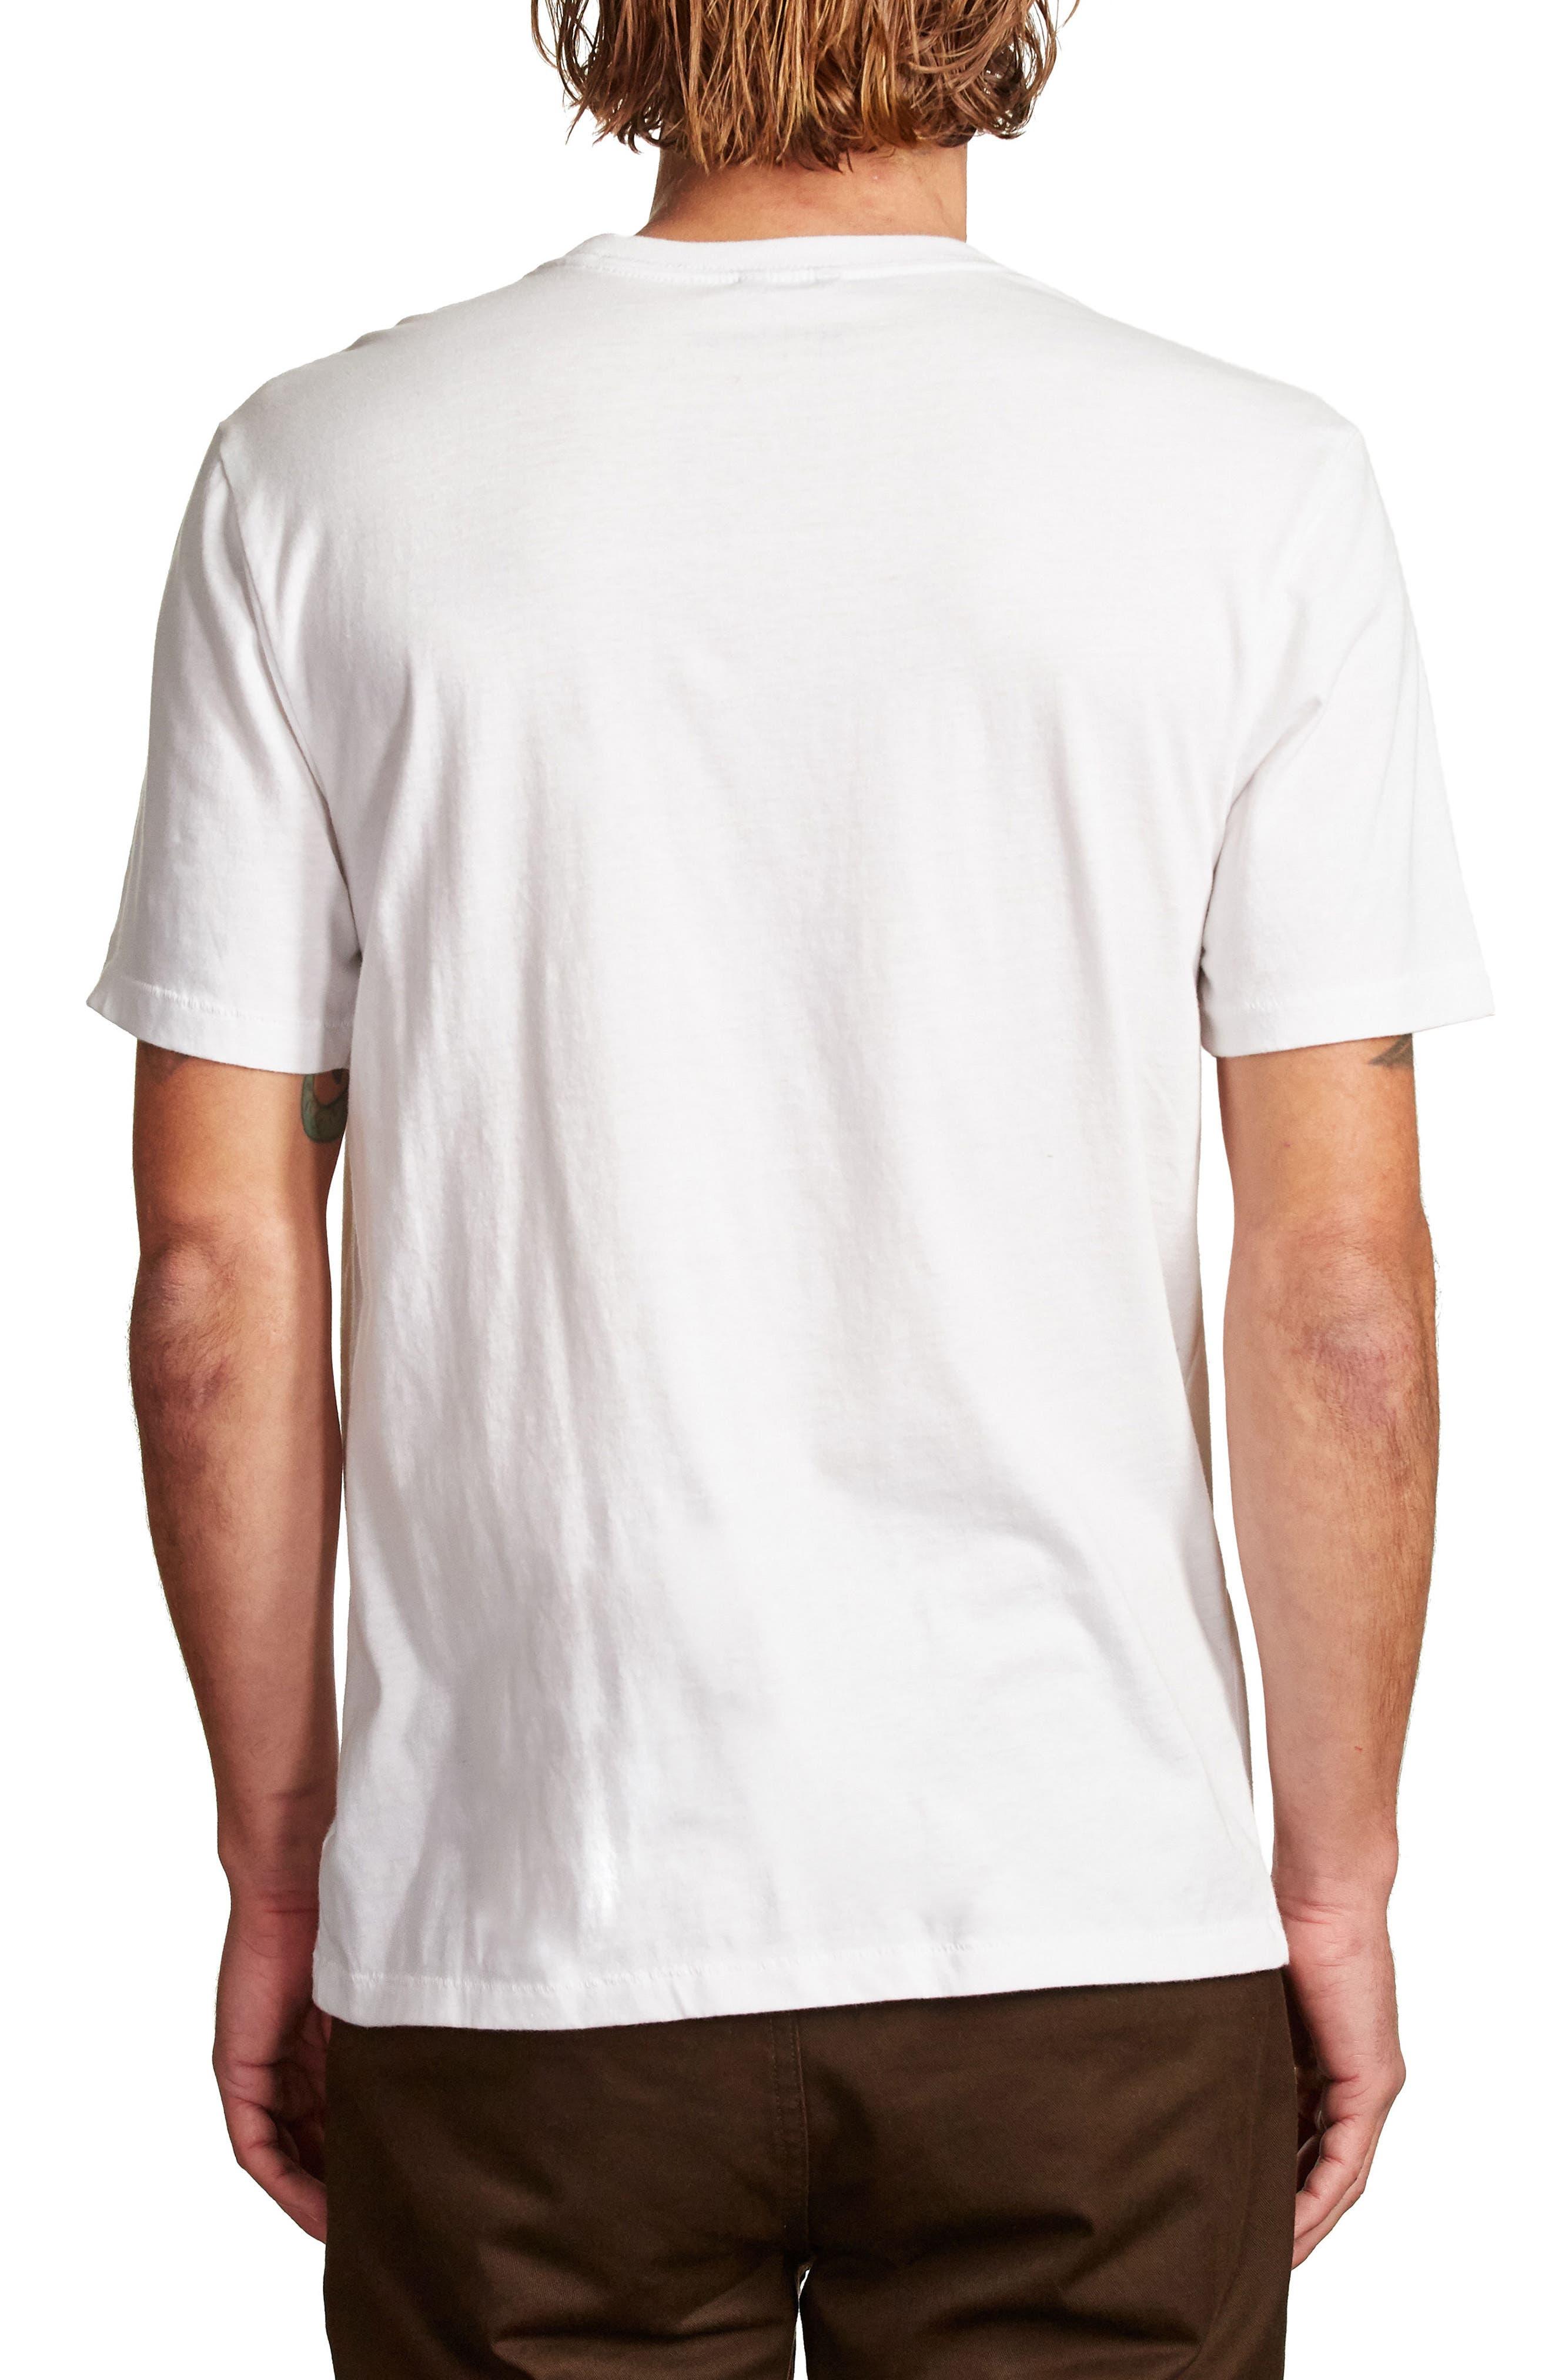 Battalion Graphic T-Shirt,                             Alternate thumbnail 2, color,                             White